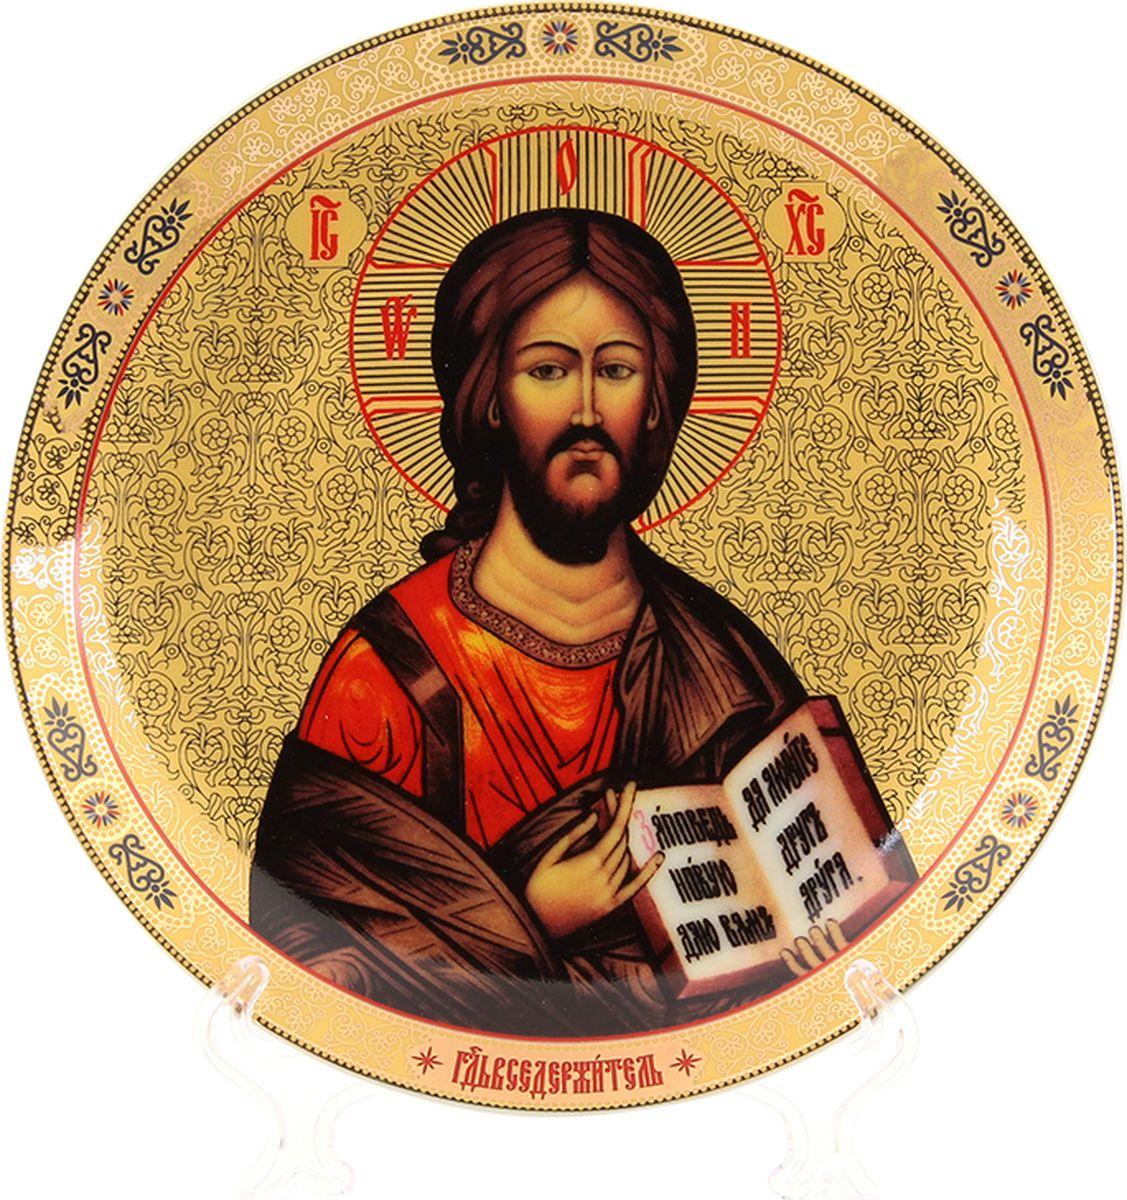 Декоративная тарелка Elan Gallery Иисус Христос690584Серия декоративных тарелок православной тематики.